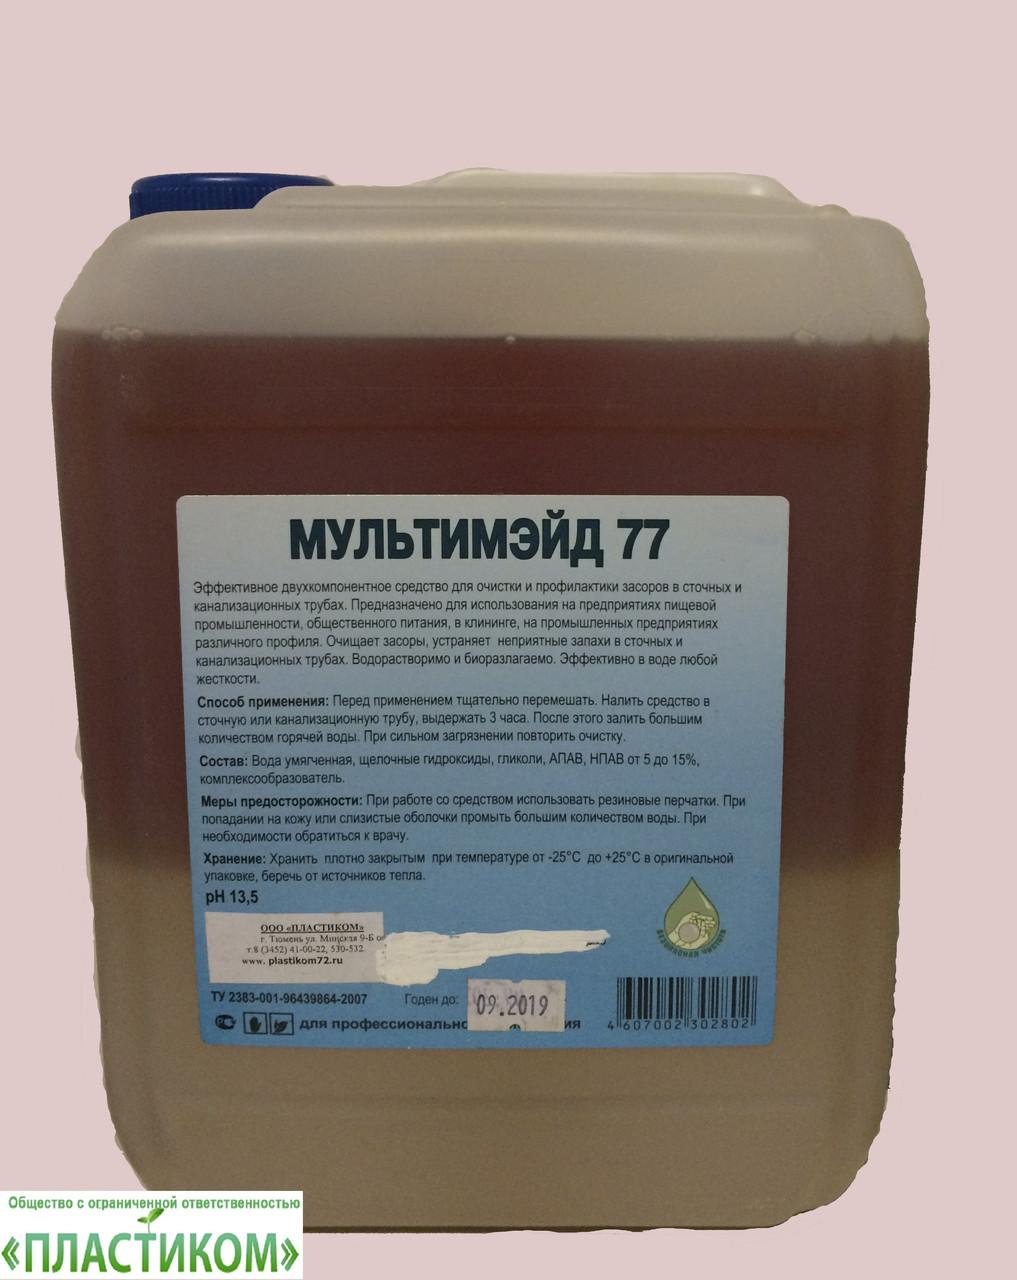 Средство для прочистки труб Мультимэйд 77 (5 литров)